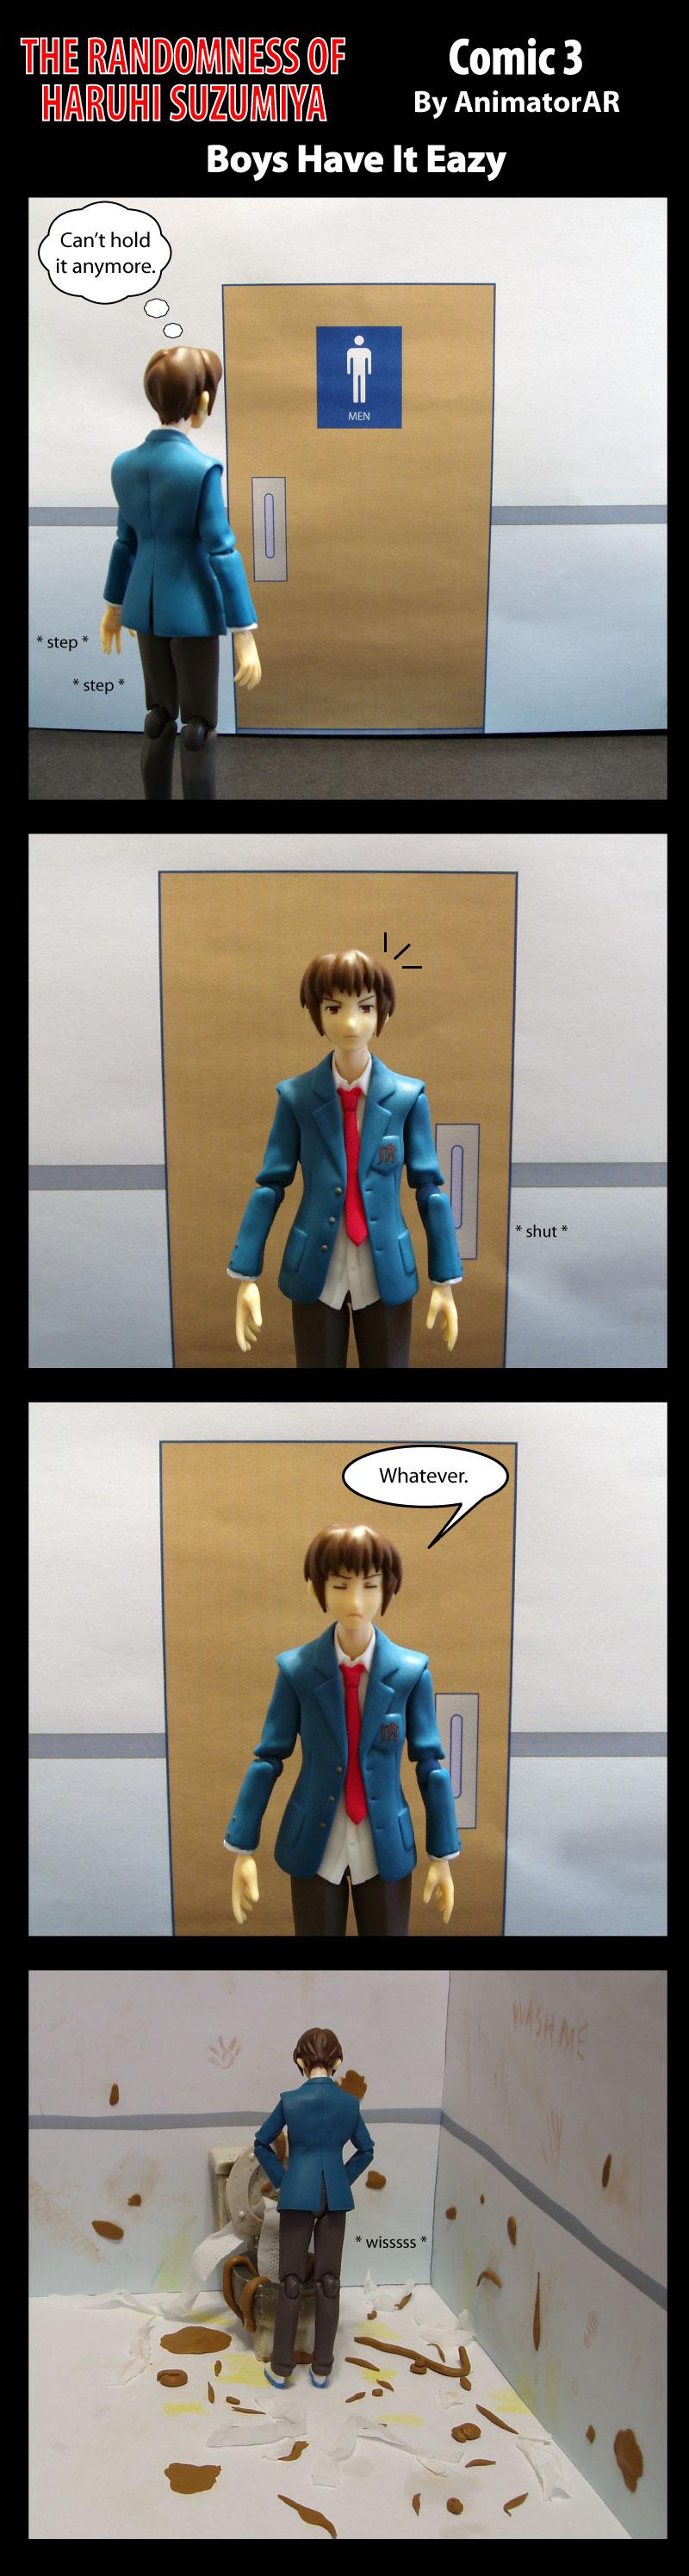 Boys Have It Easy by AnimatorAR